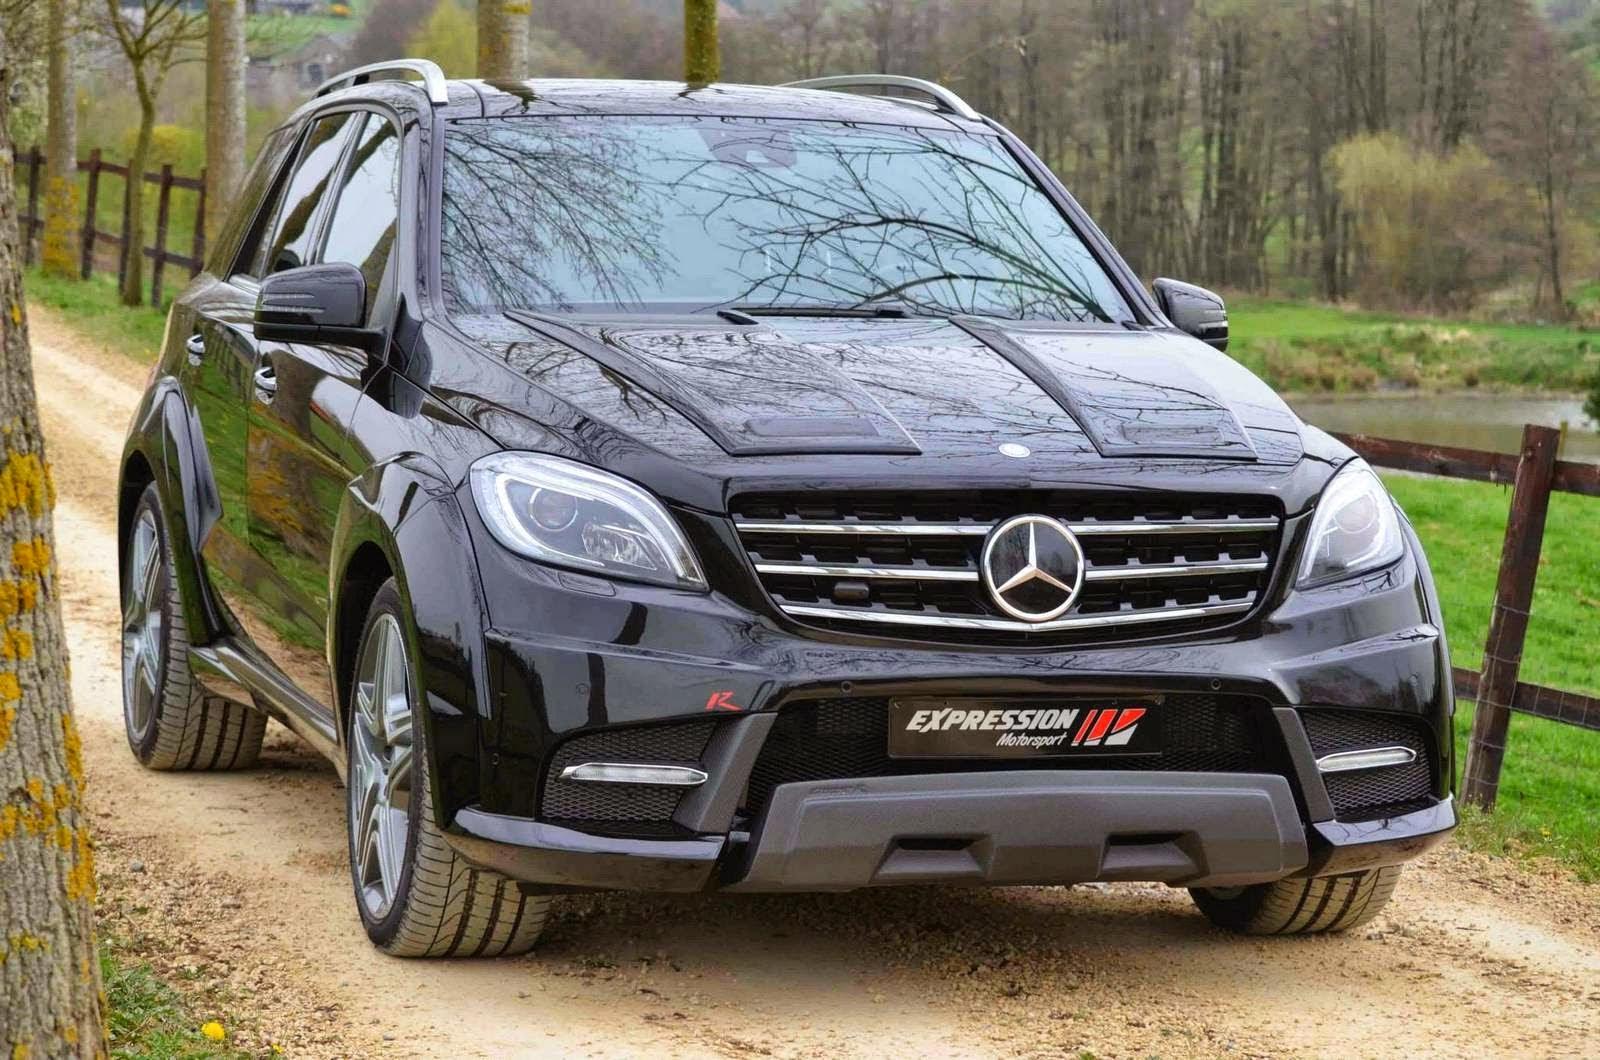 Automotivegeneral 2017 topcar mercedes benz ml 63 amg for Mercedes benz ml 2017